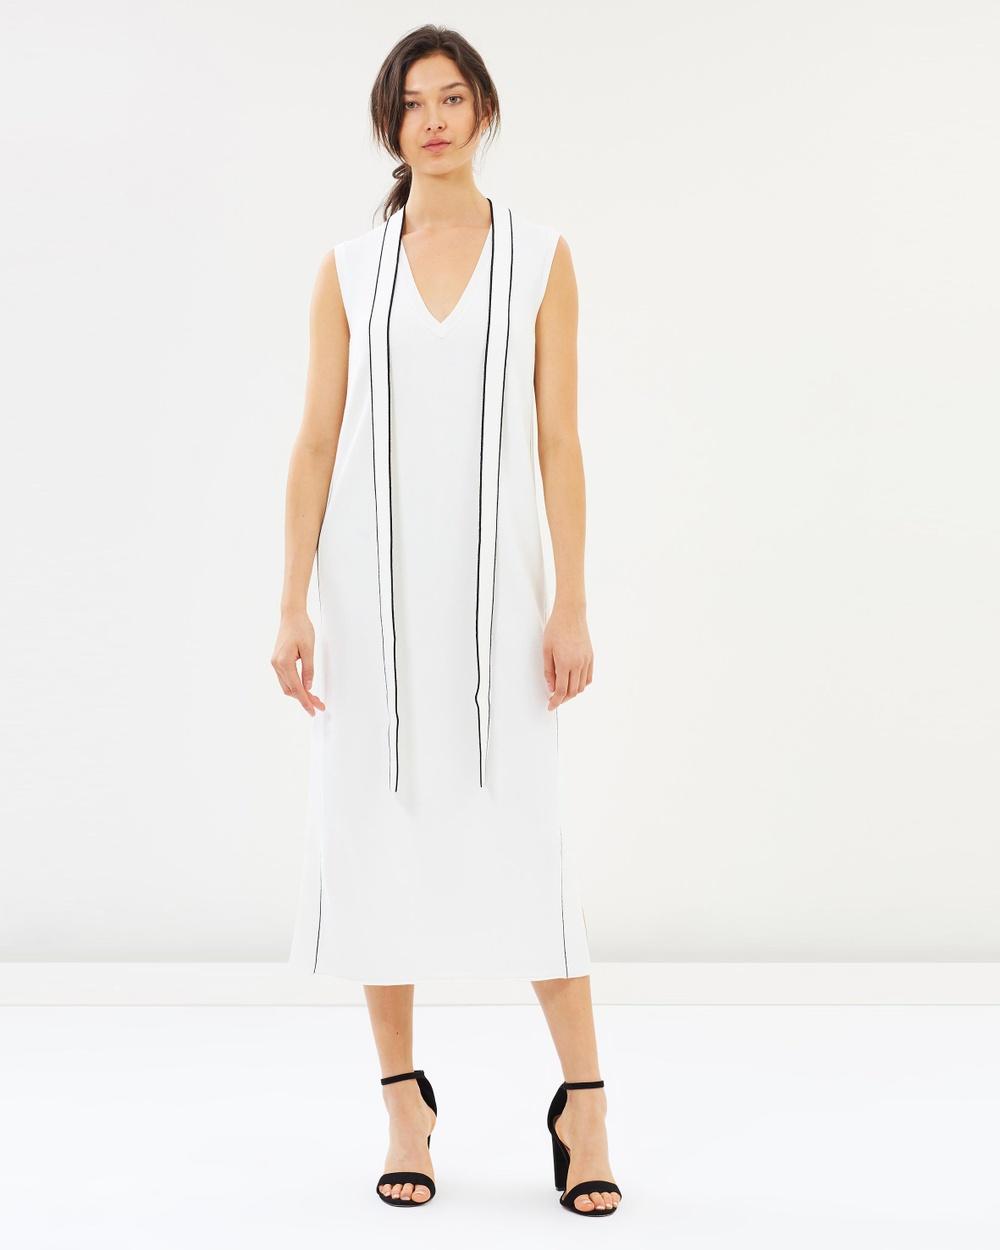 House of Dagmar Off-White Hiro Dress